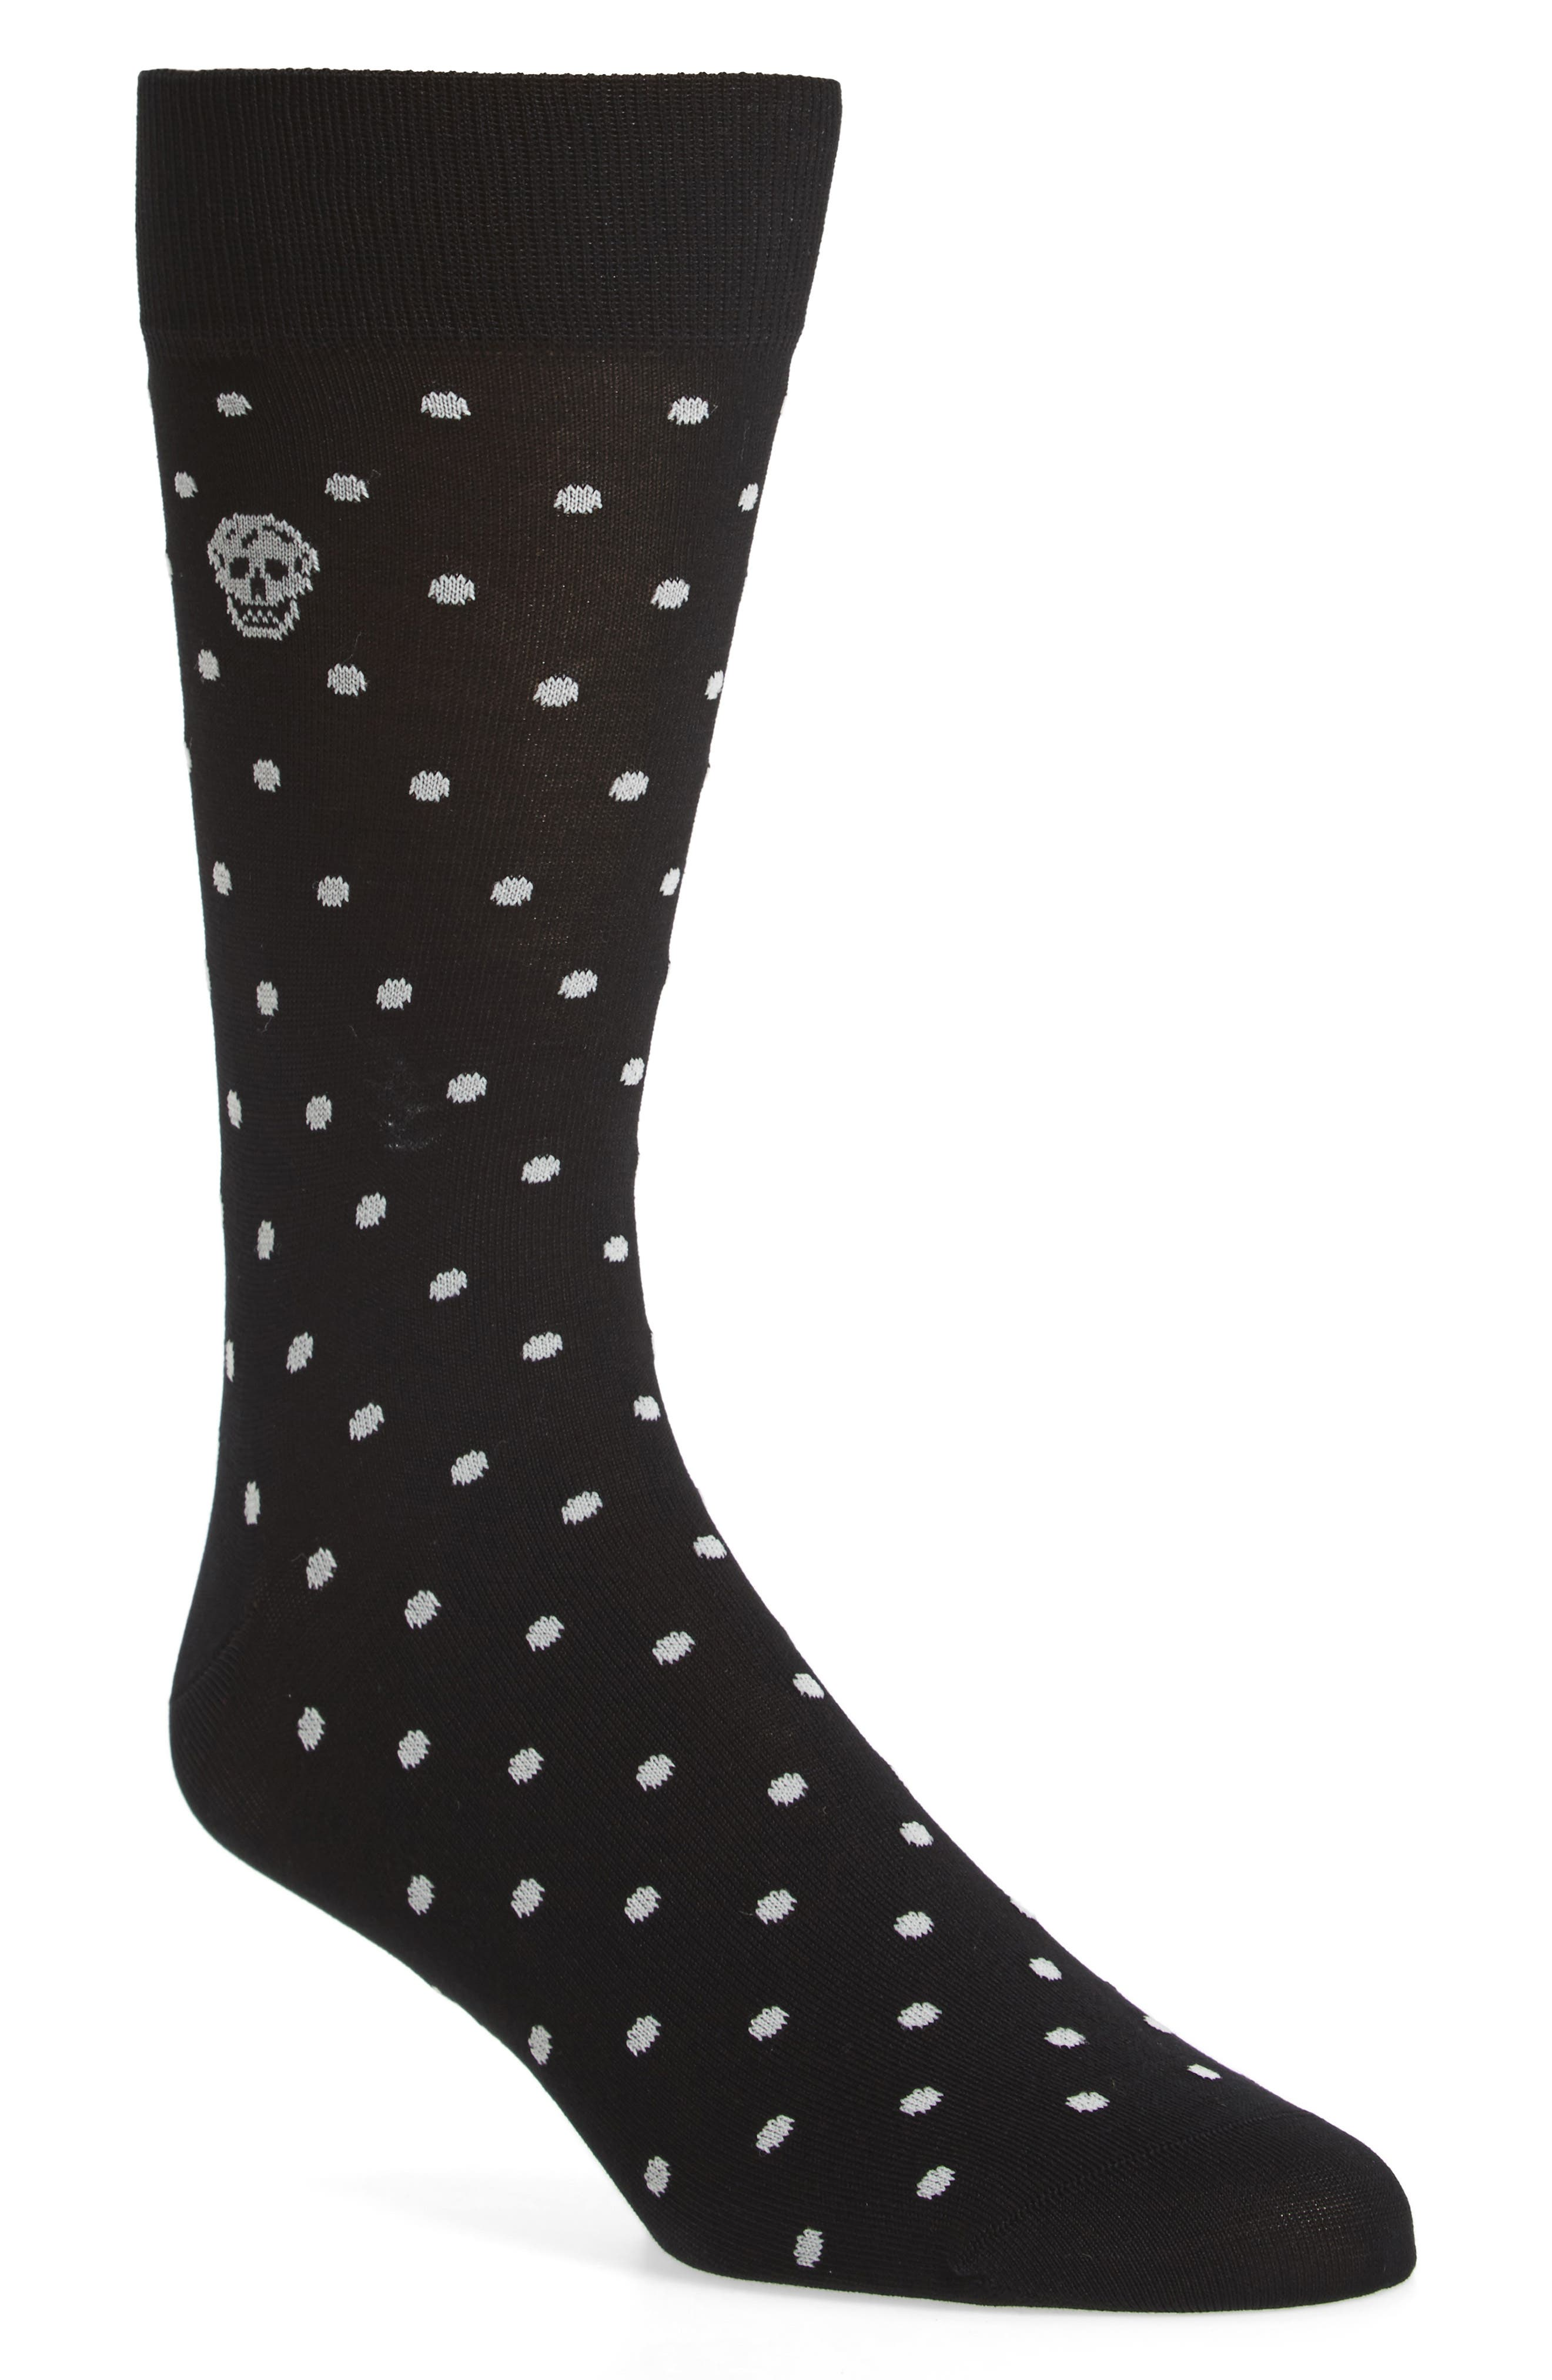 Main Image - Alexander McQueen Cotton Blend Polka Dot Socks